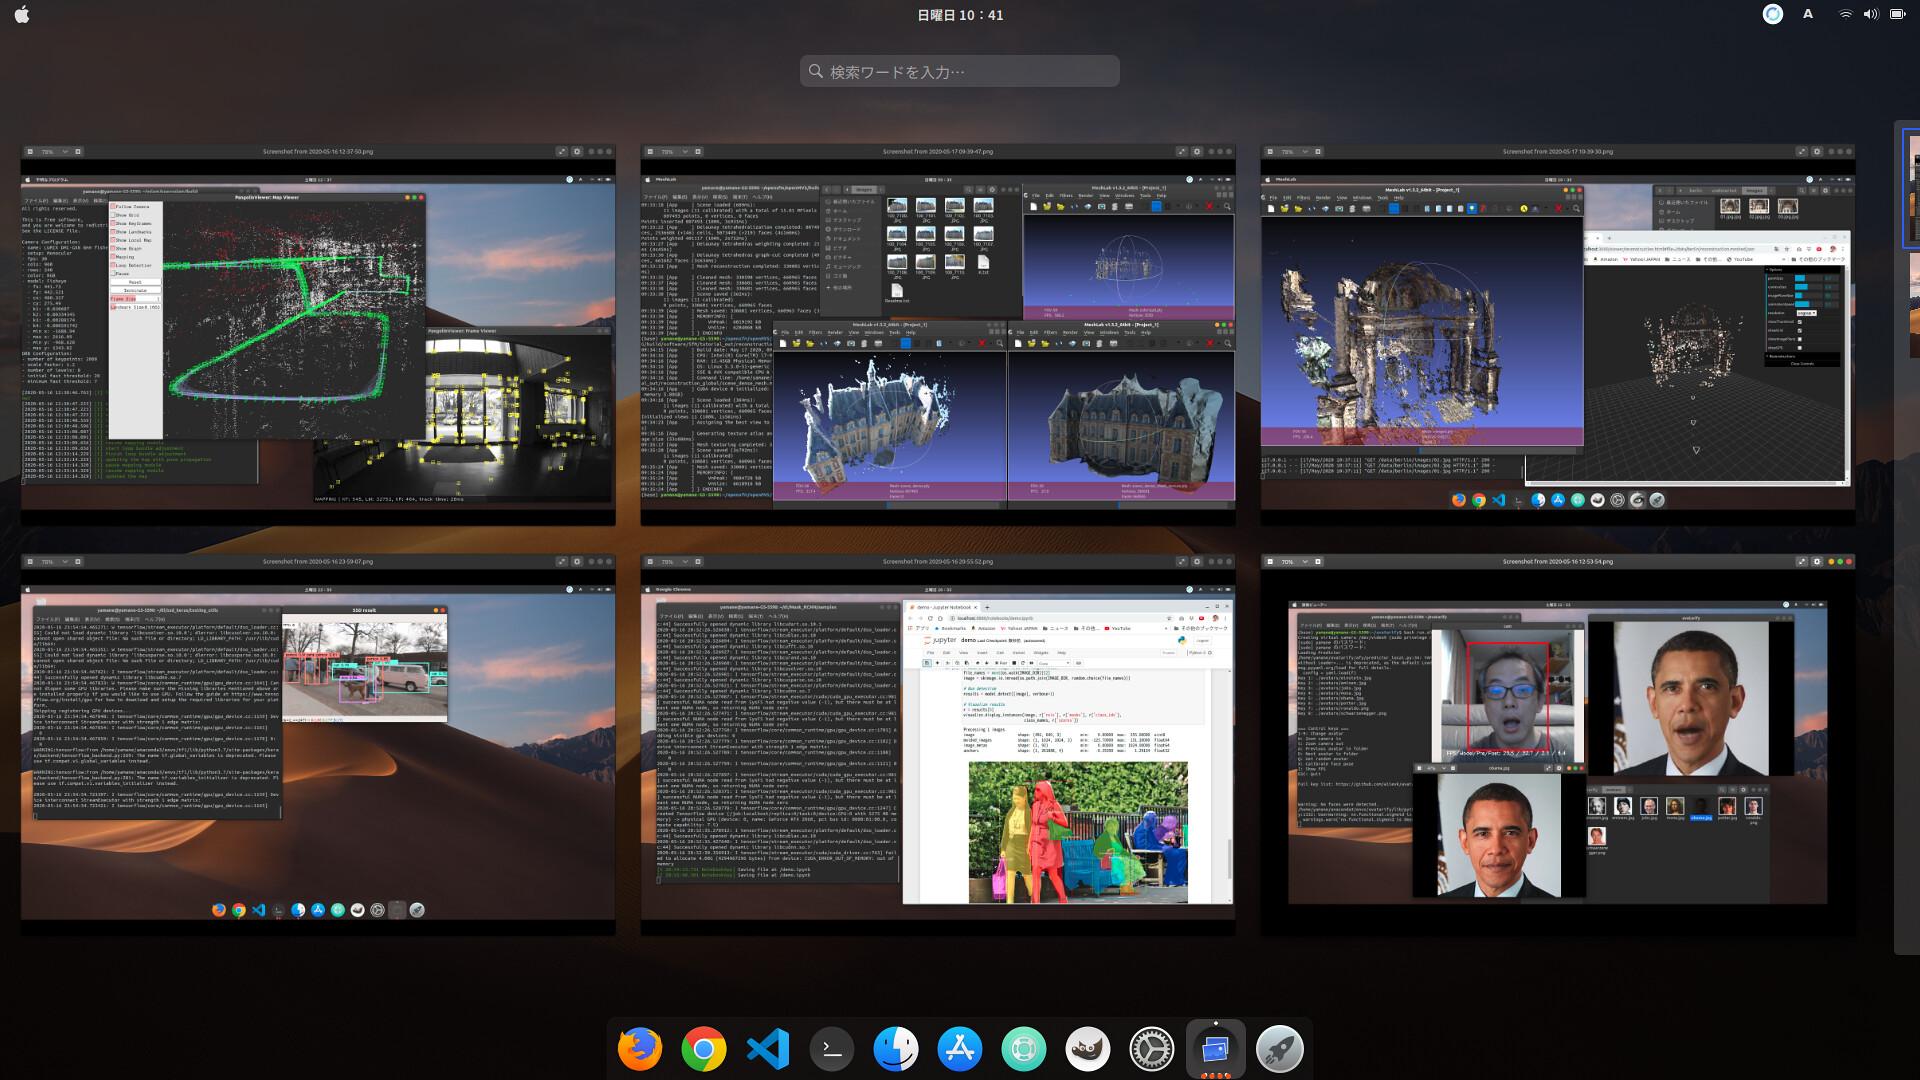 Ubuntu 18.04+GPU で遊ぶ Visual SLAM,  Structure from Motion, Deep Learningなどの先進技術